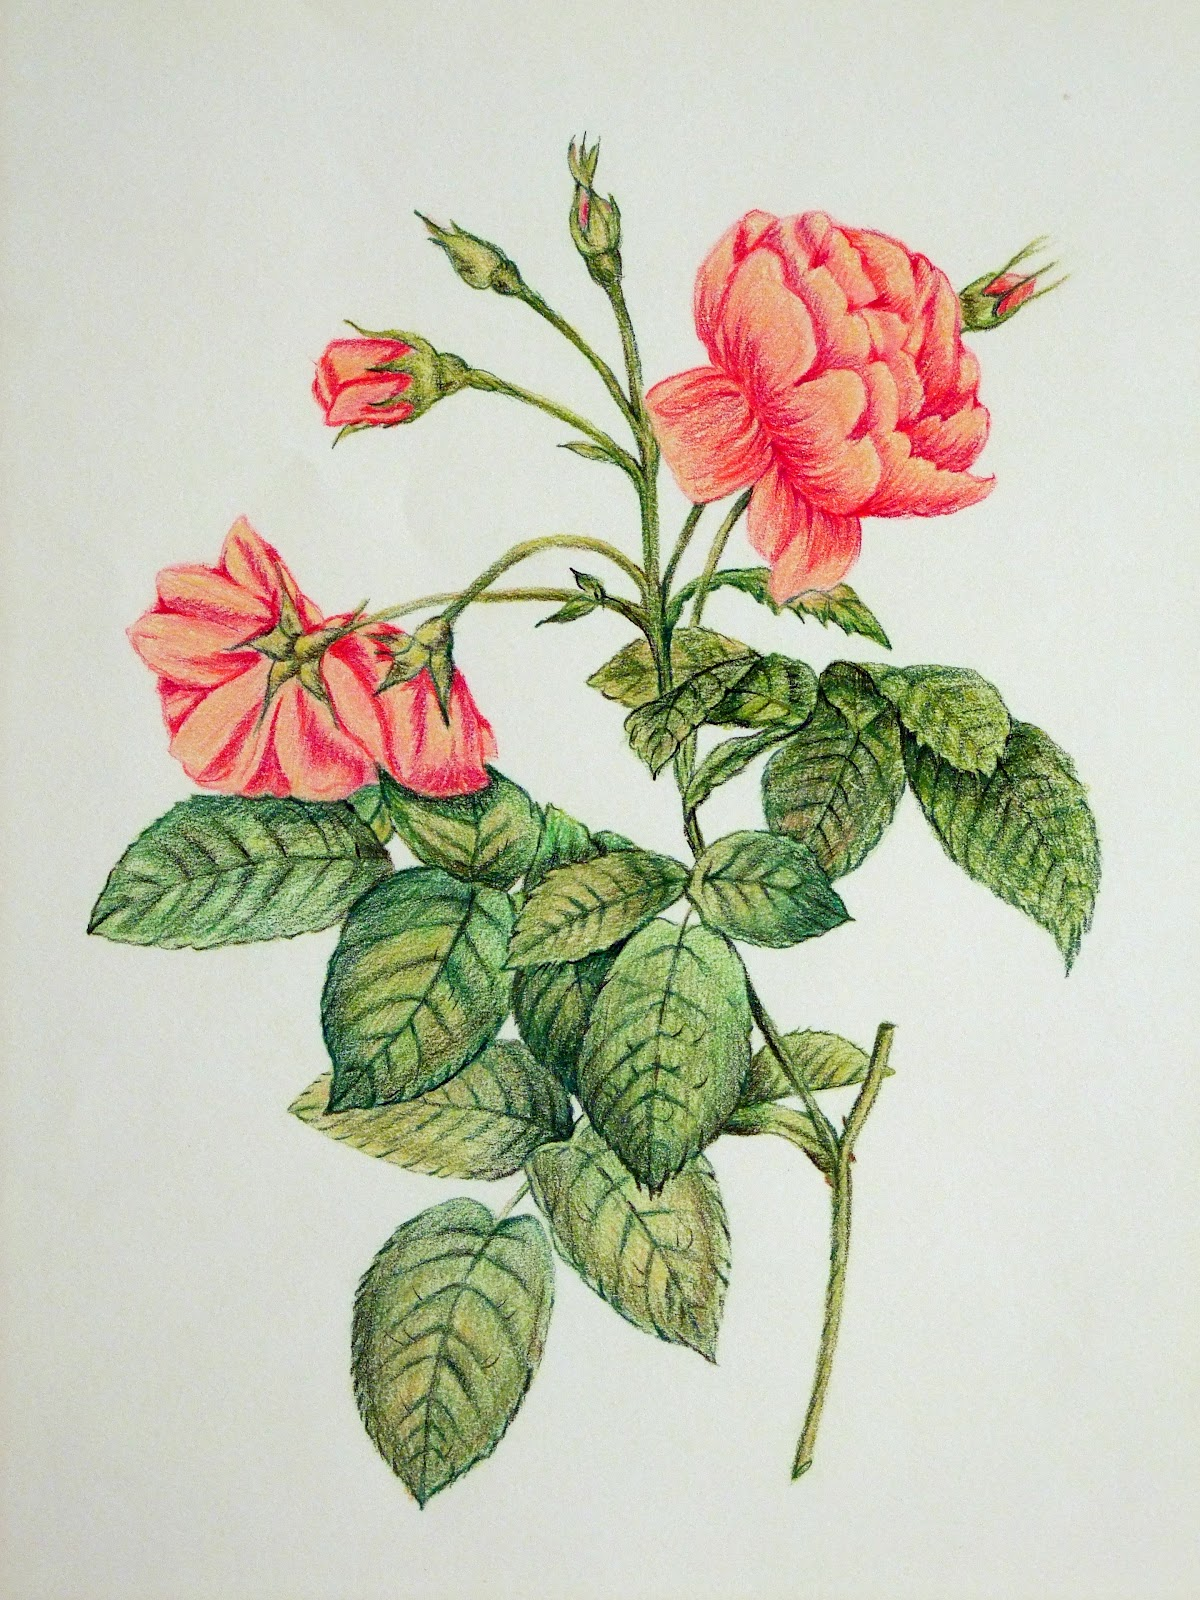 "My Artbox ""Orange Rose"" 12x16 Colored Pencils on Canson"